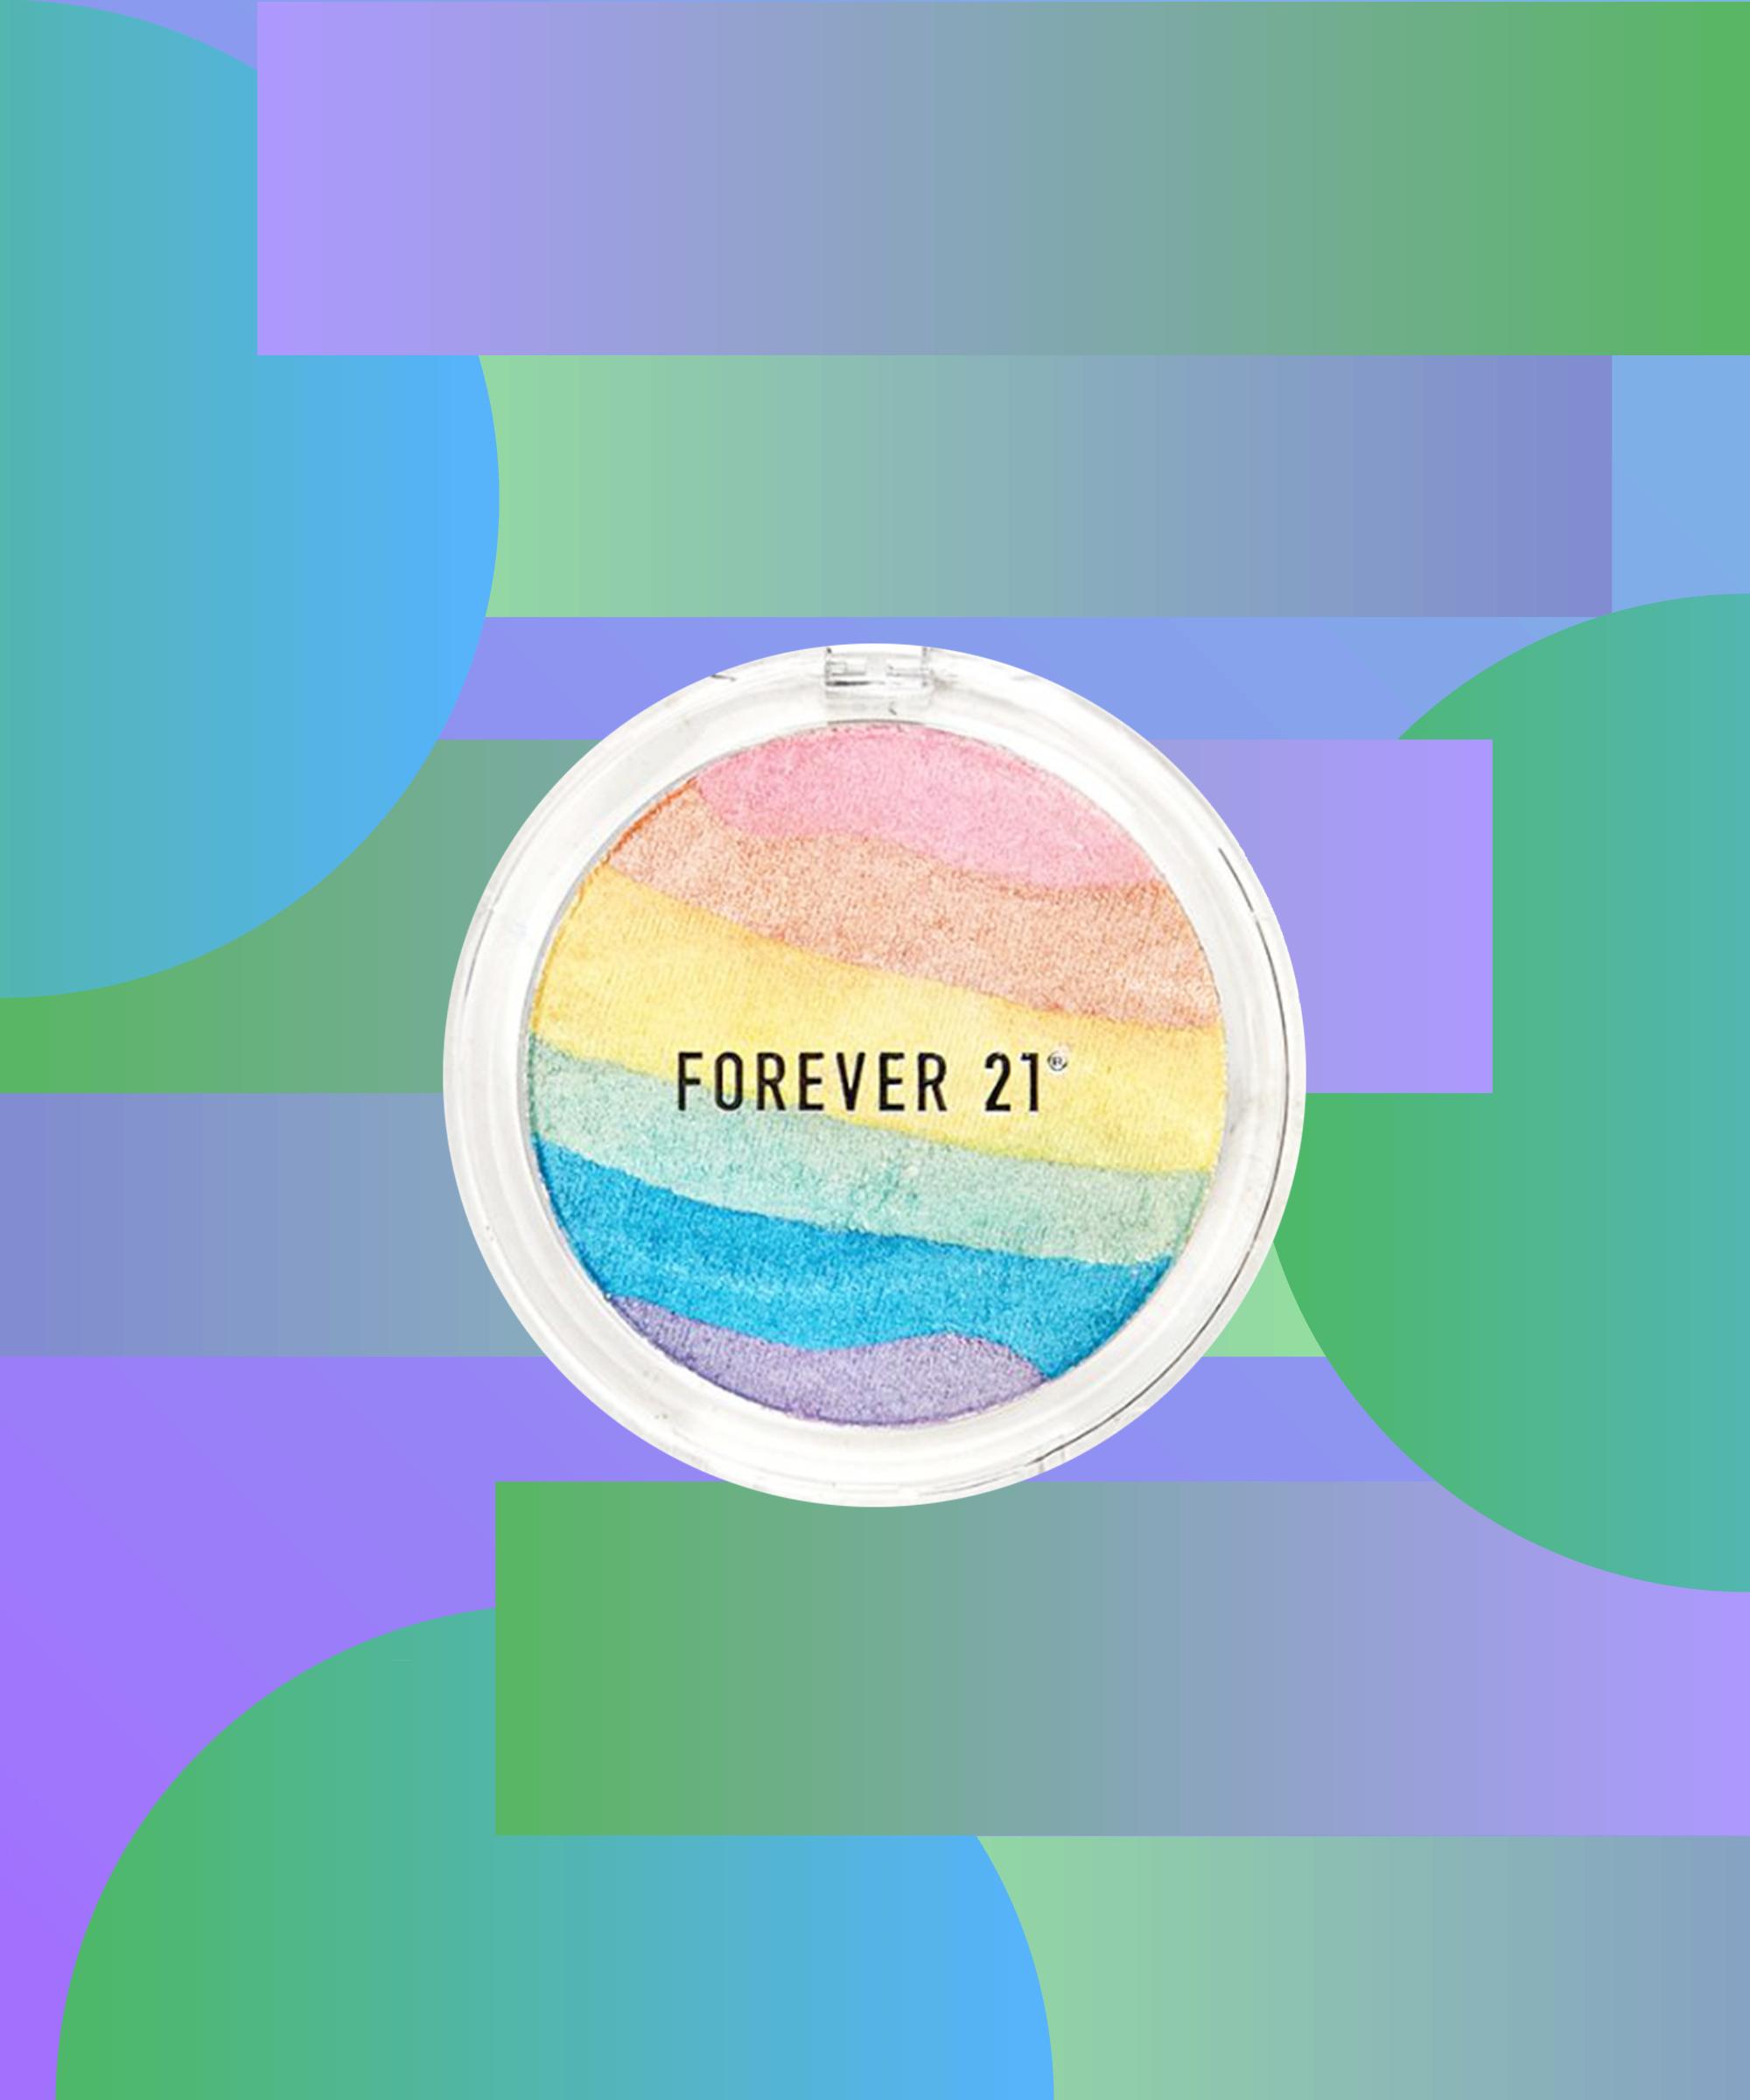 Forever 21 Makeup Rainbow Highlighter